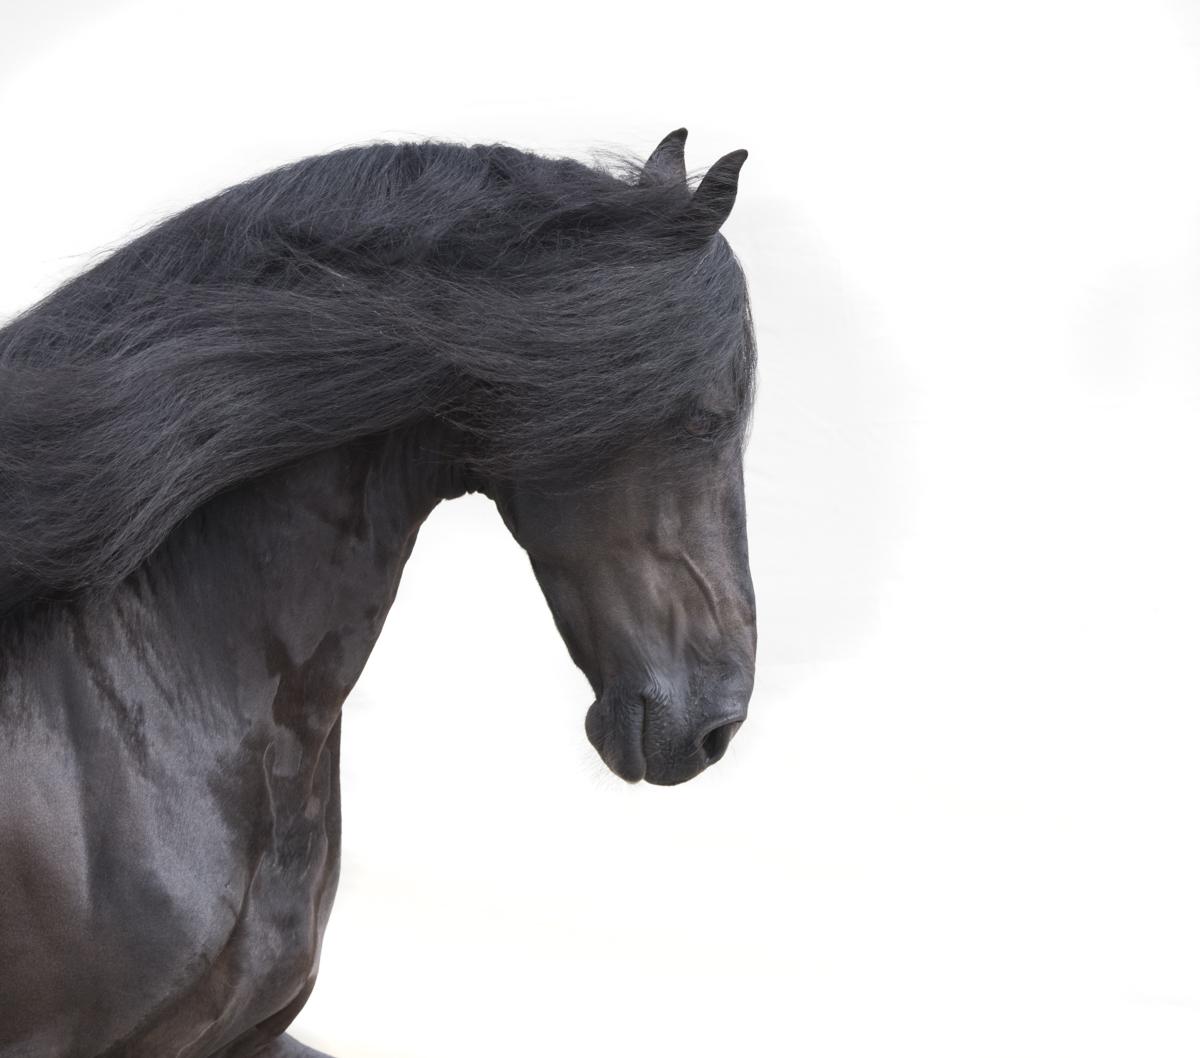 Equine 595